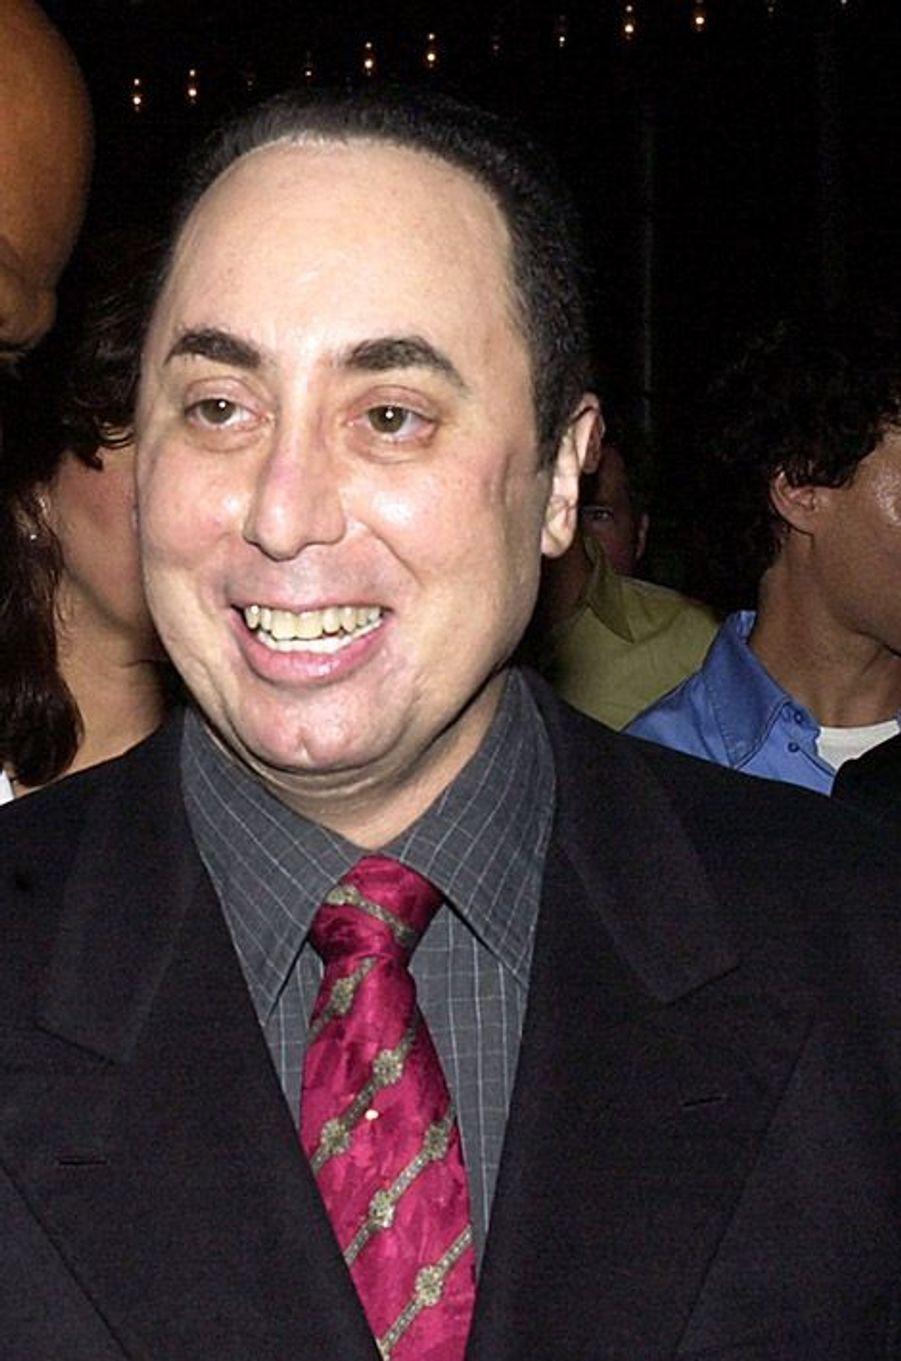 David Gest en 2002